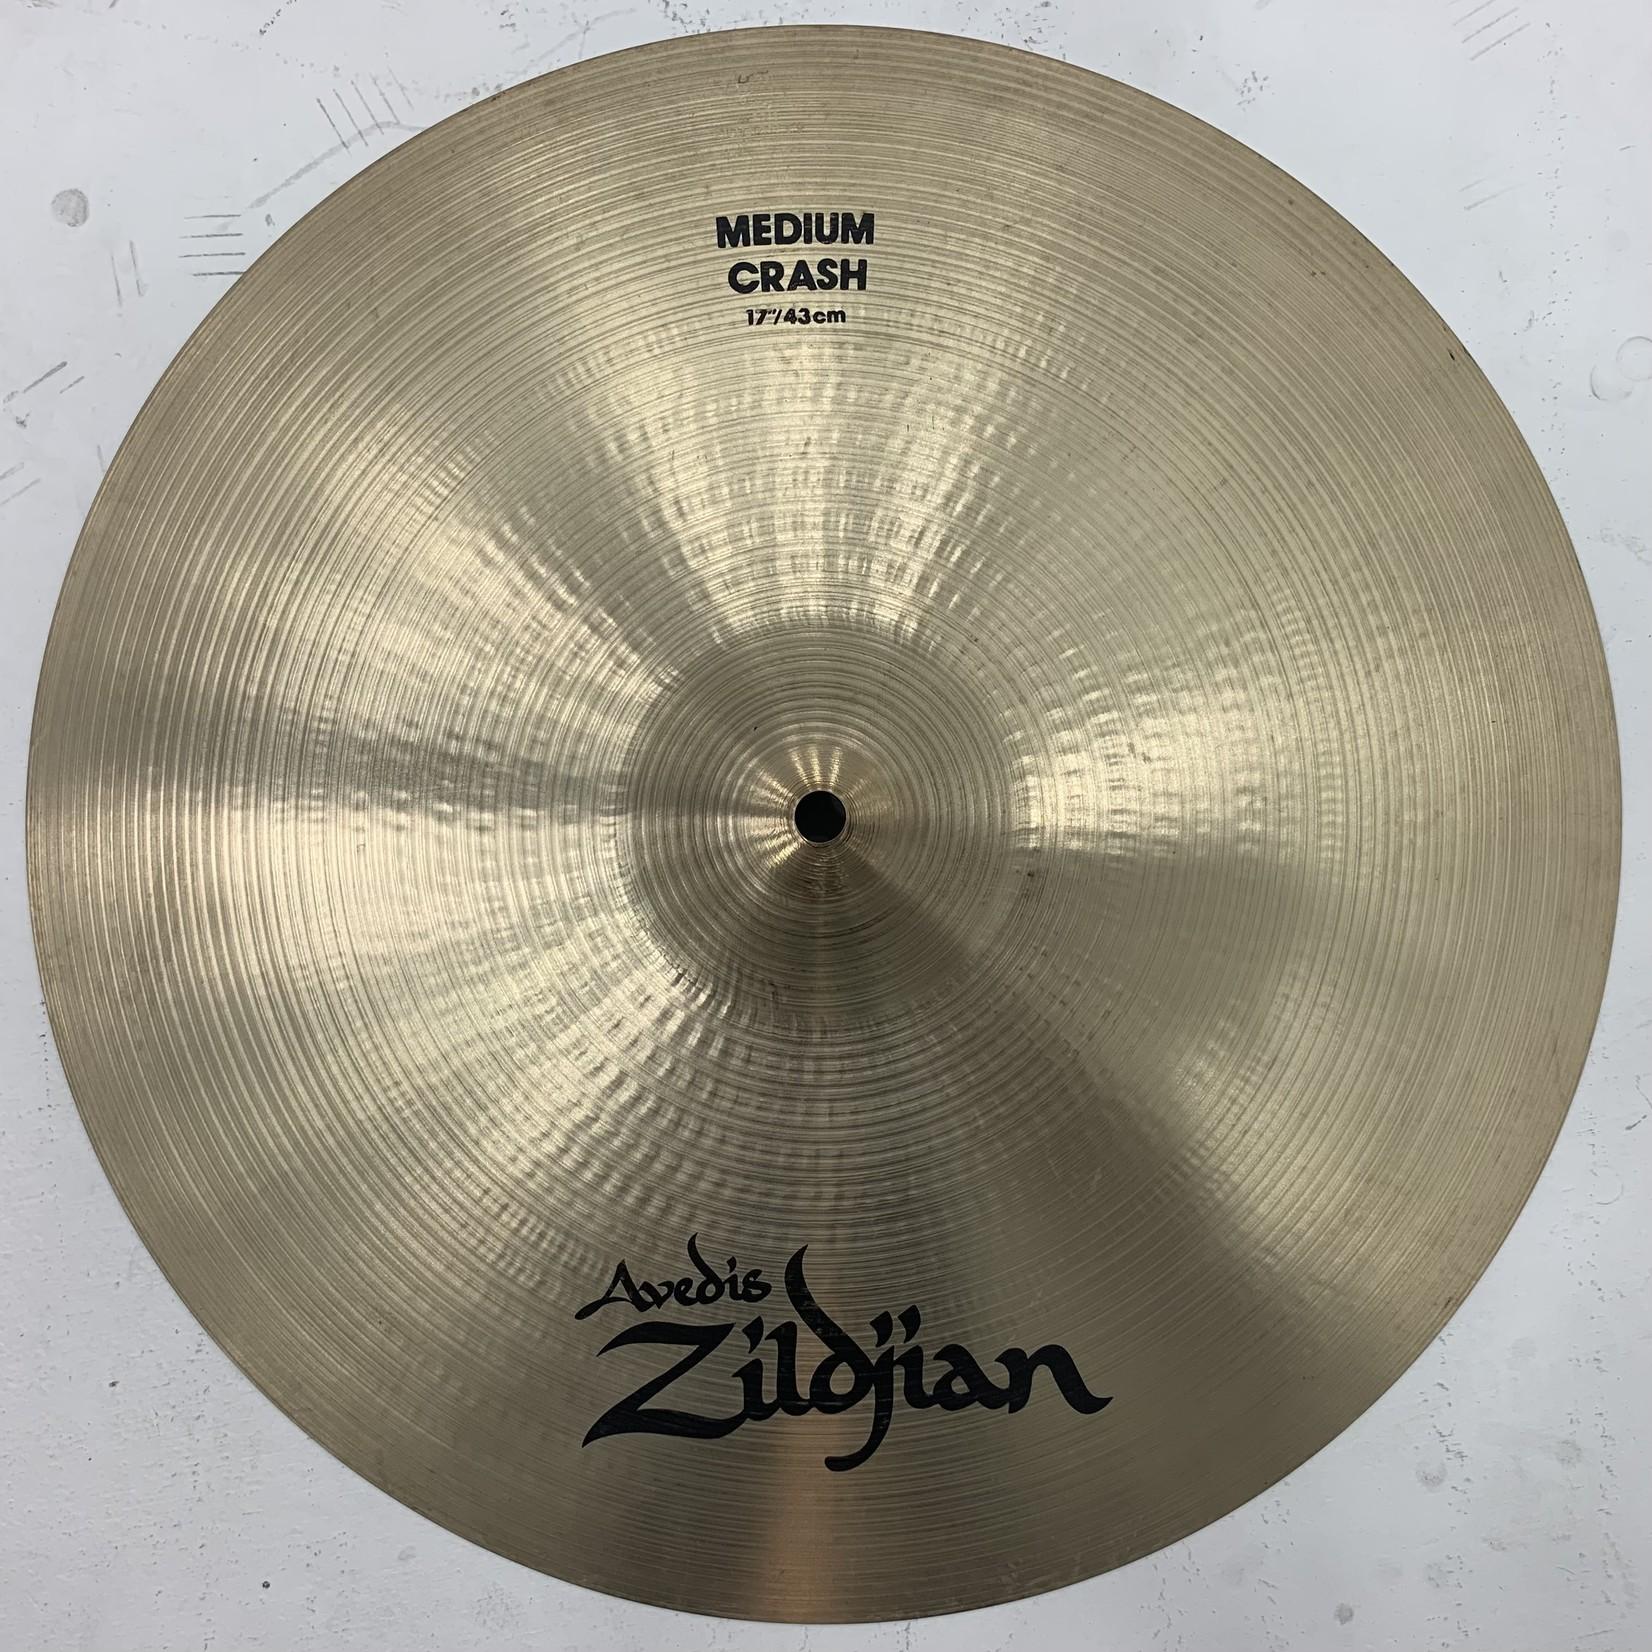 "USED Zildjian A 17"" Medium Crash Cymbal (Michael Wagener Collection)"